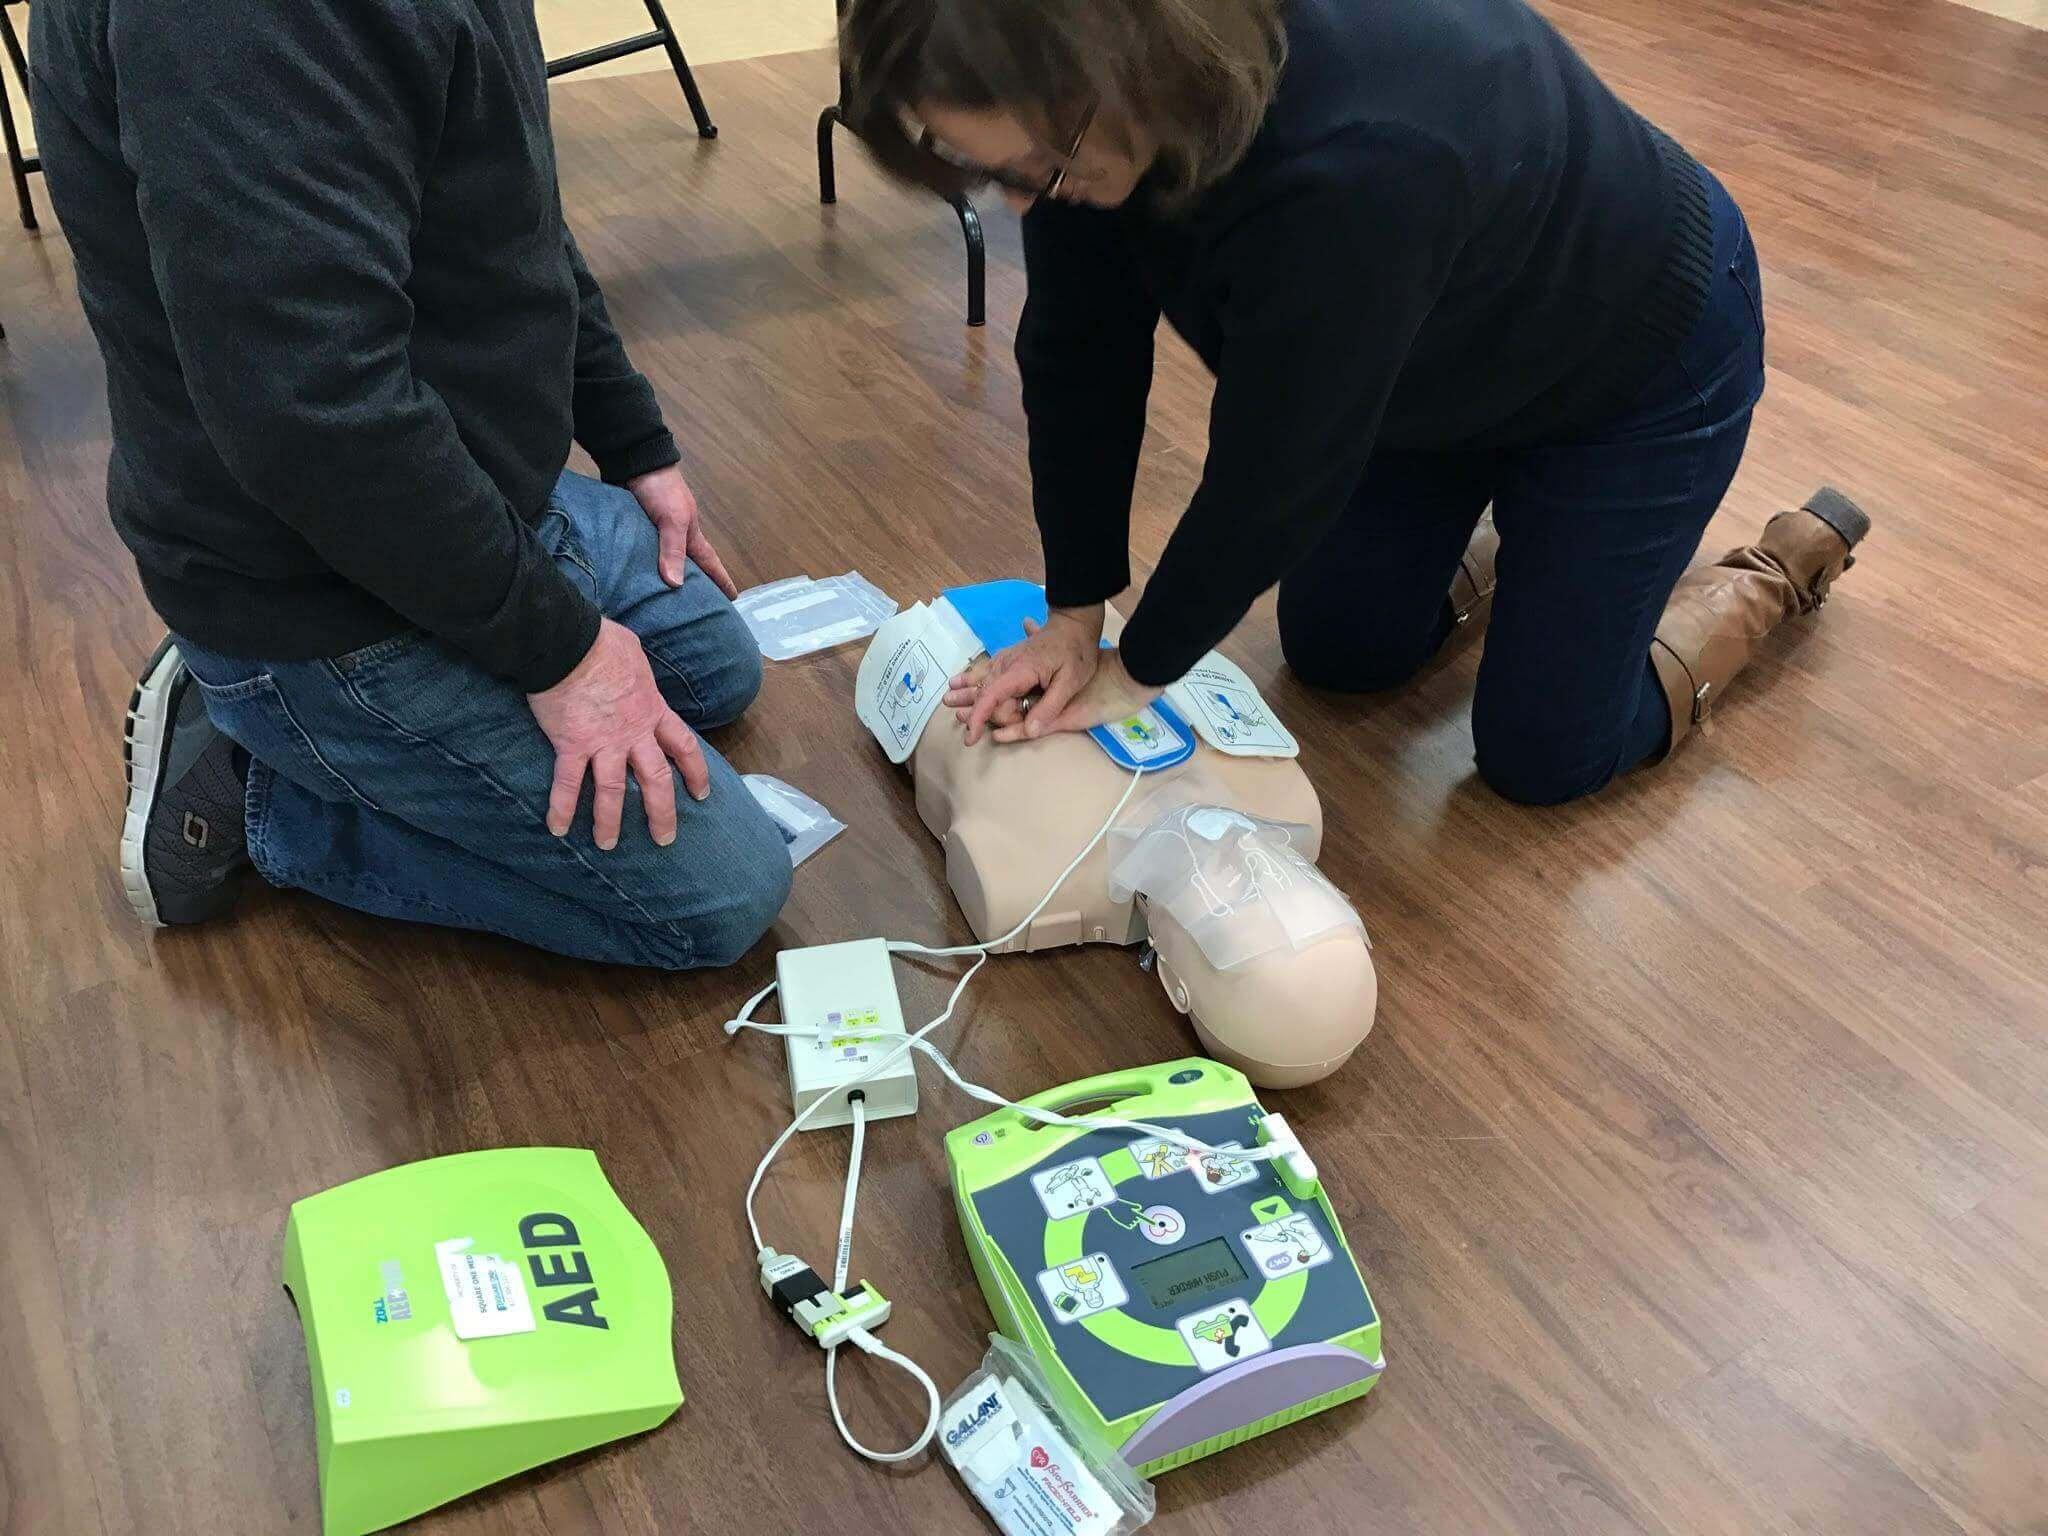 First Aid Adult/Pediatric Class